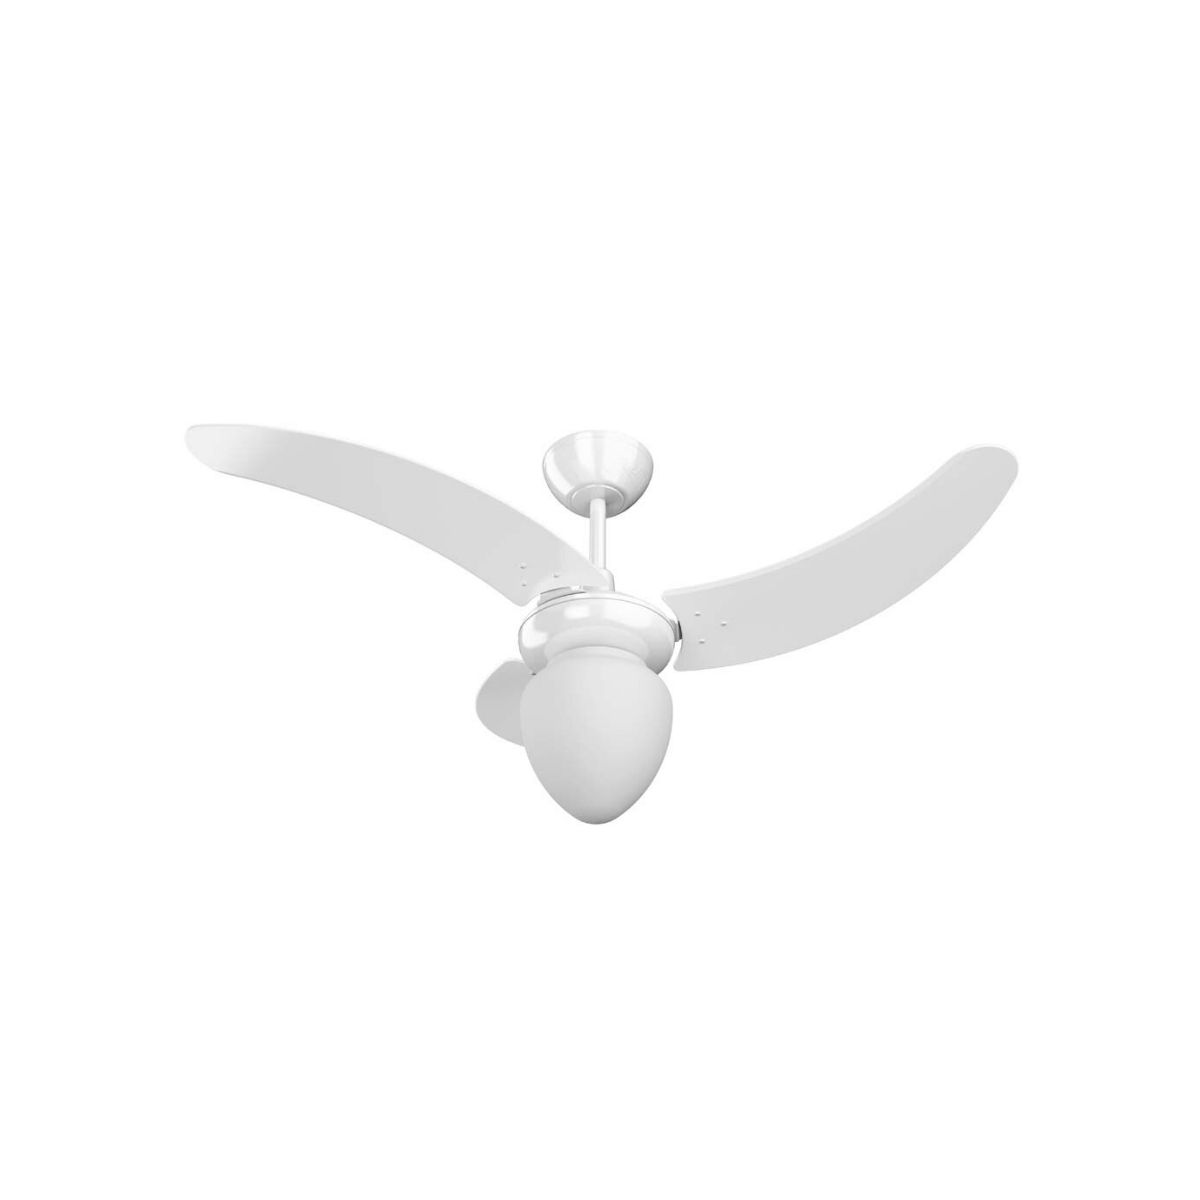 Ventilador de Teto Búzios Max Tron 220V Branco